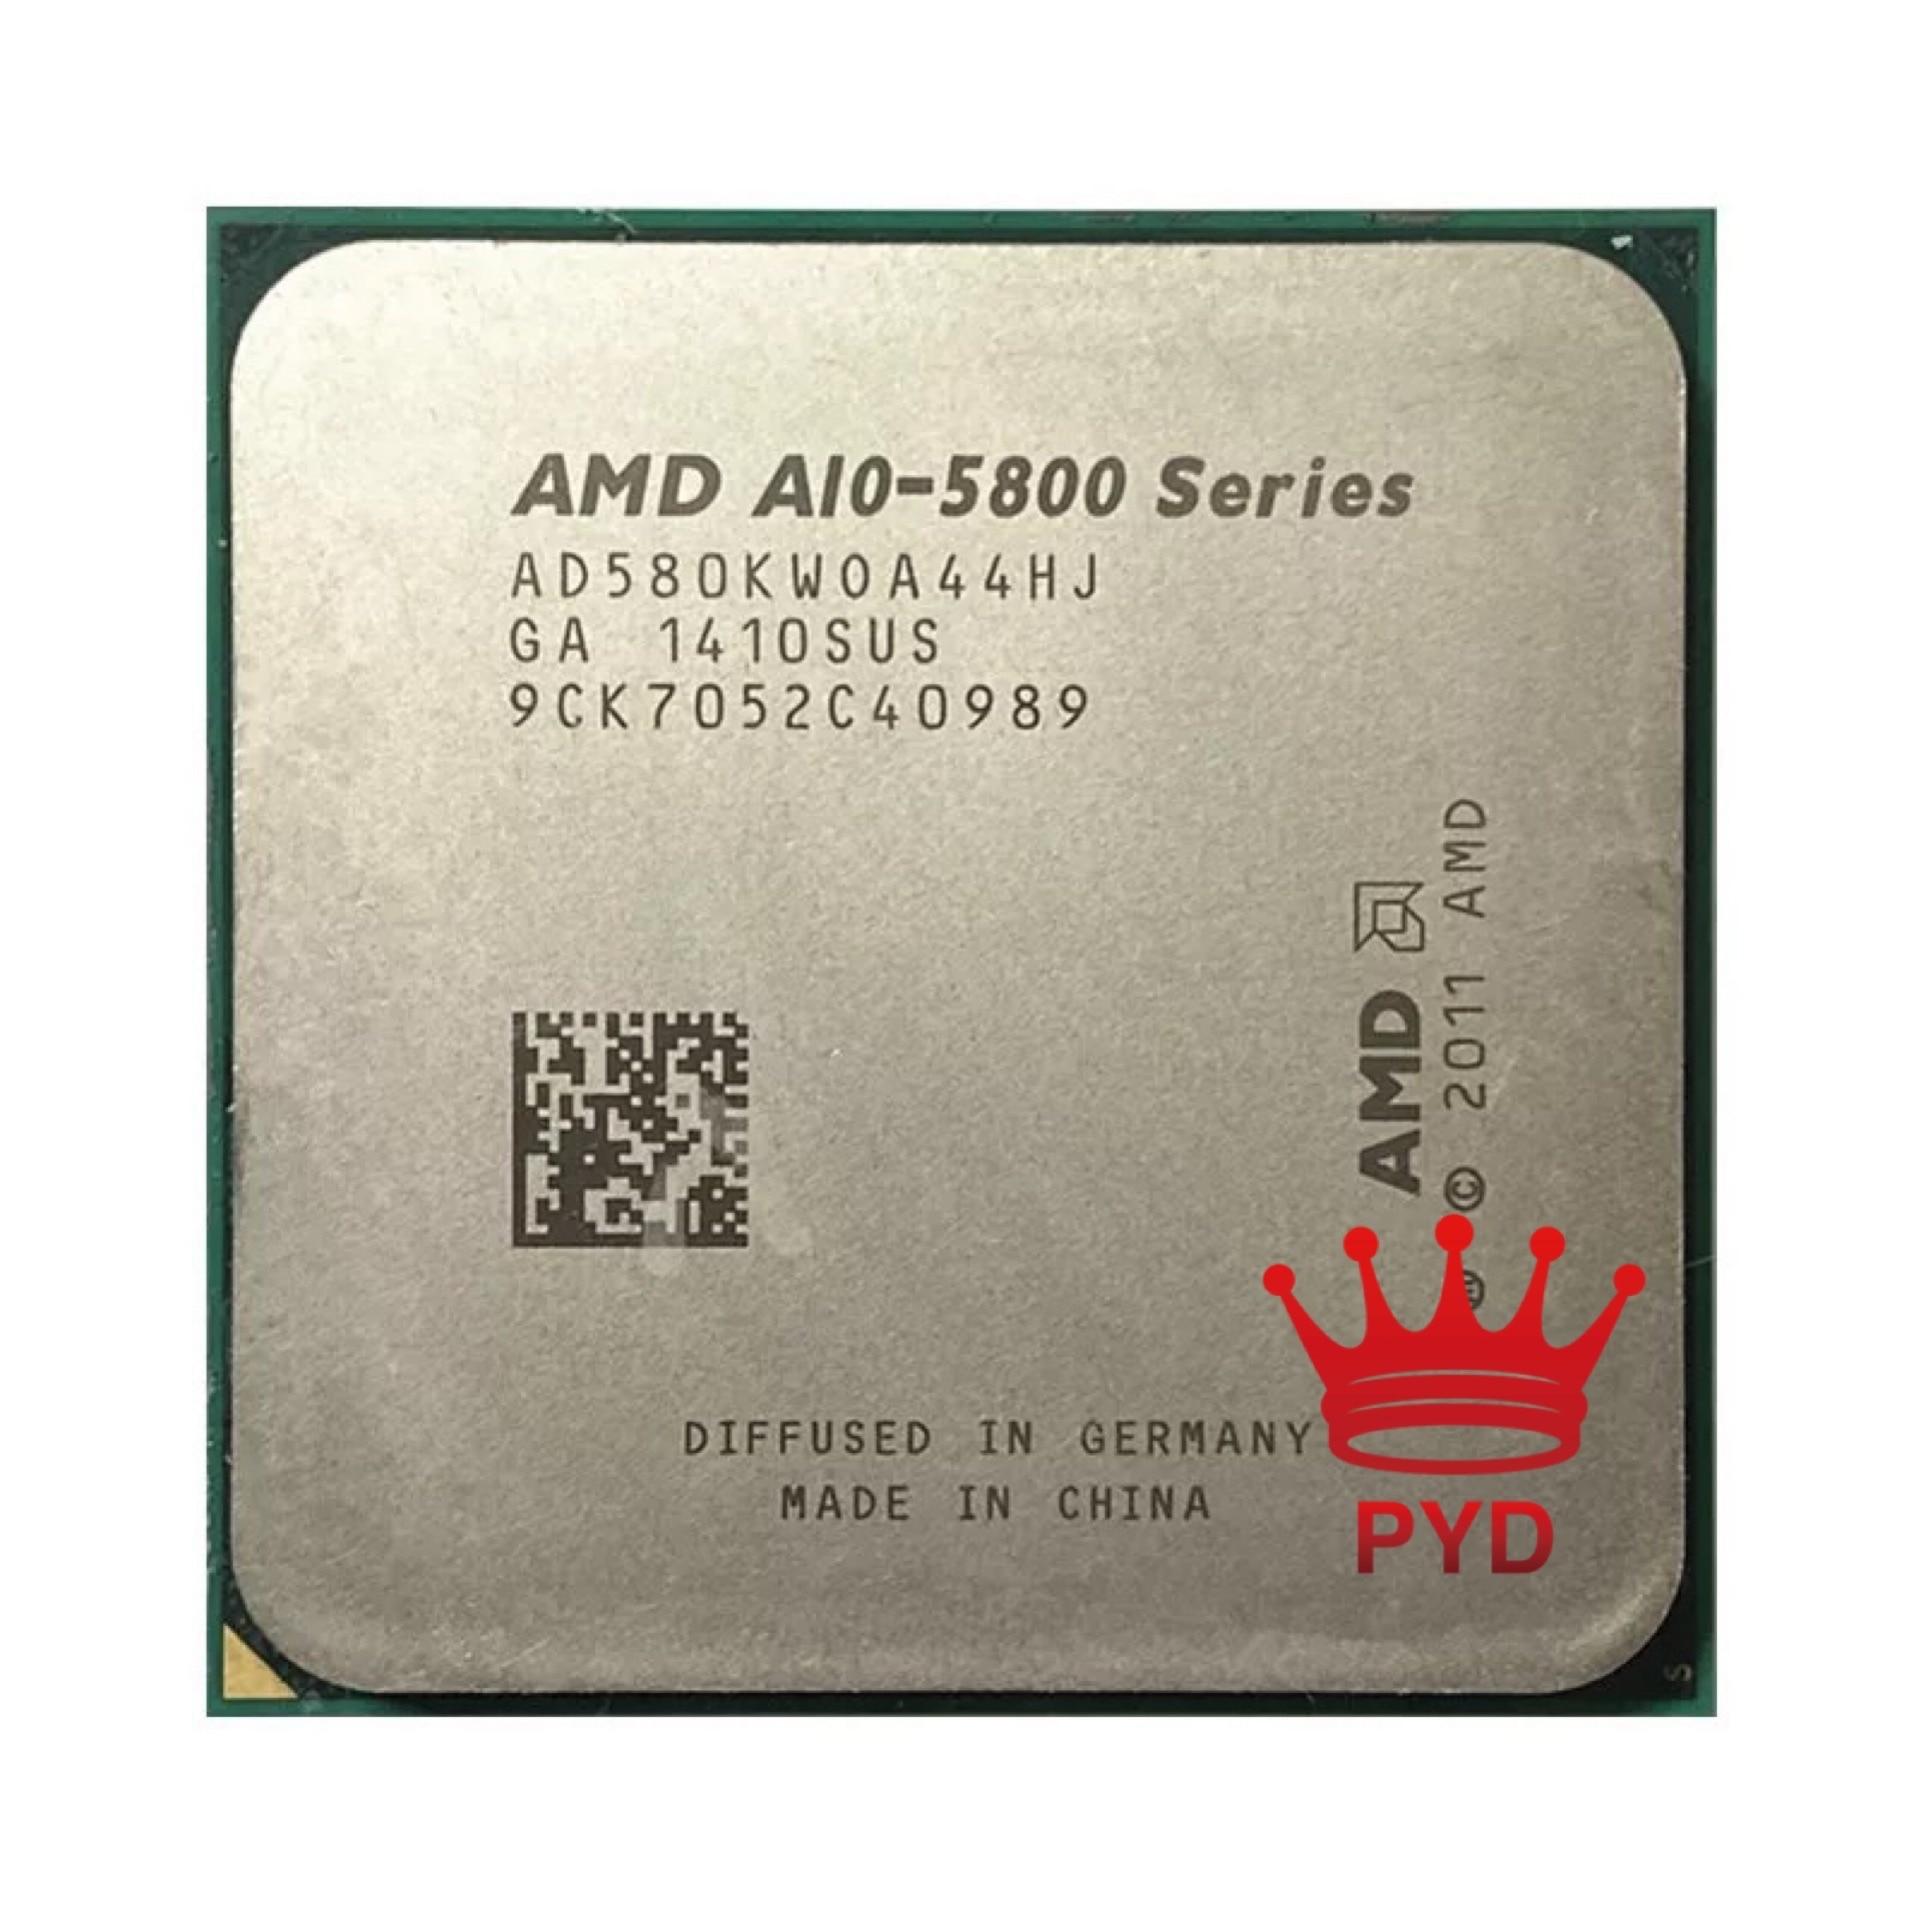 Четырехъядерный процессор AMD A10-Series A10 5800K A10 5800 AD580KWOA44HJ/AD580BWOA44HJ 0 разъем FM2